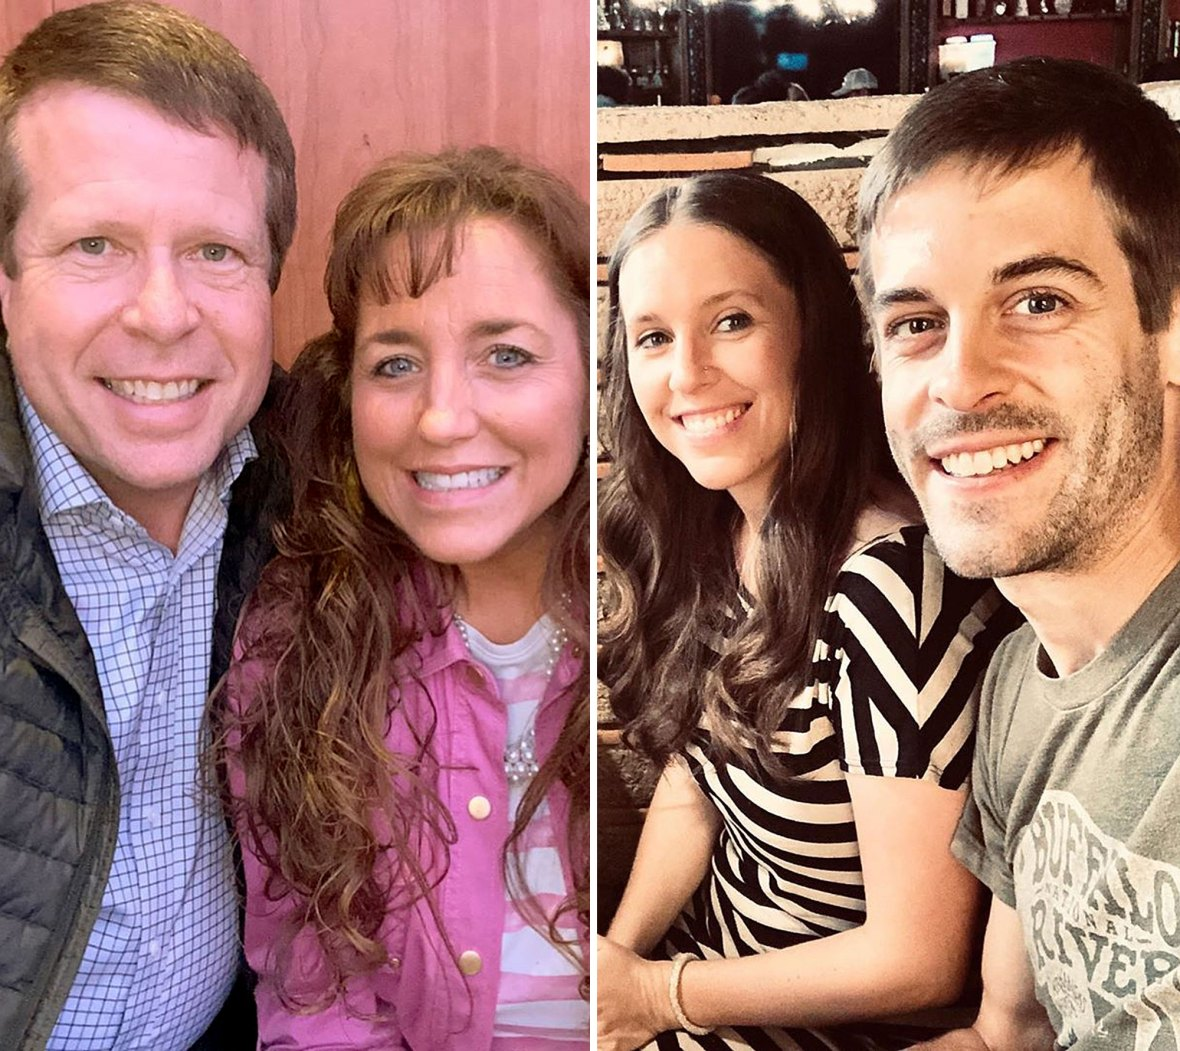 Jim Bob and Michelle Duggar Speak Out Amid Jill Duggar Revelations About Family Drama